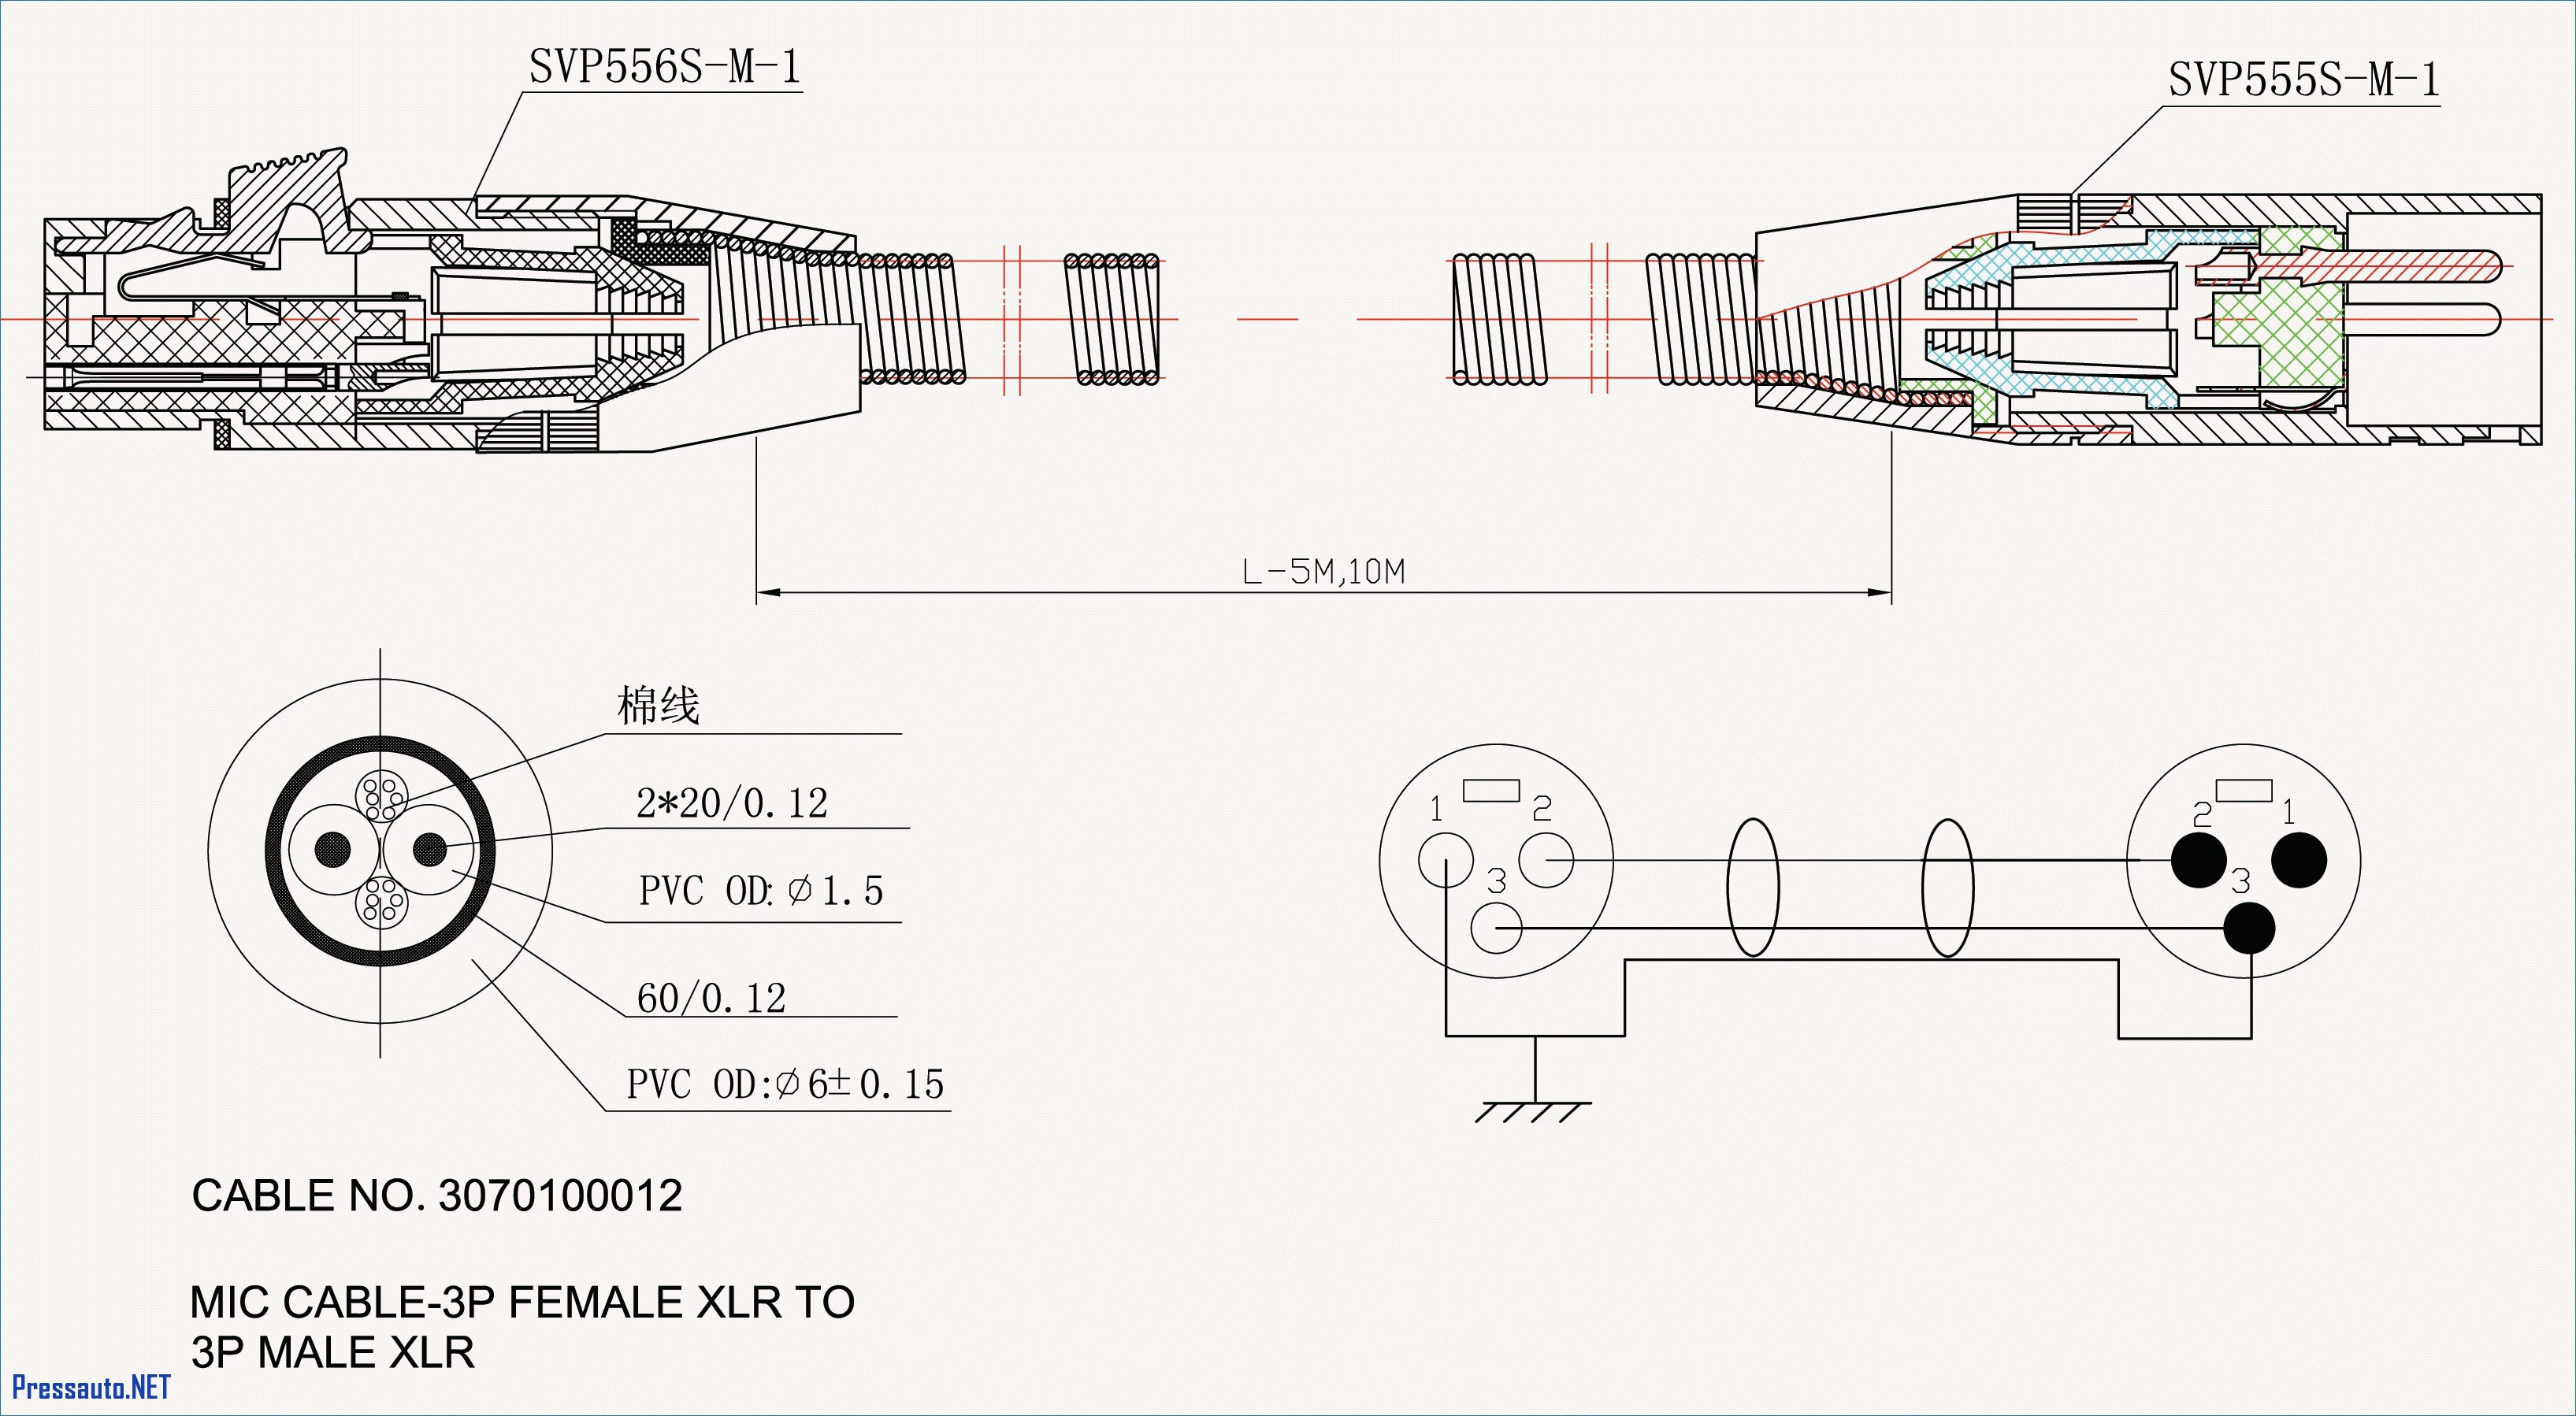 Nissan Engine Diagram Xlr Wiring Block Diagram Visio Of Nissan Engine Diagram